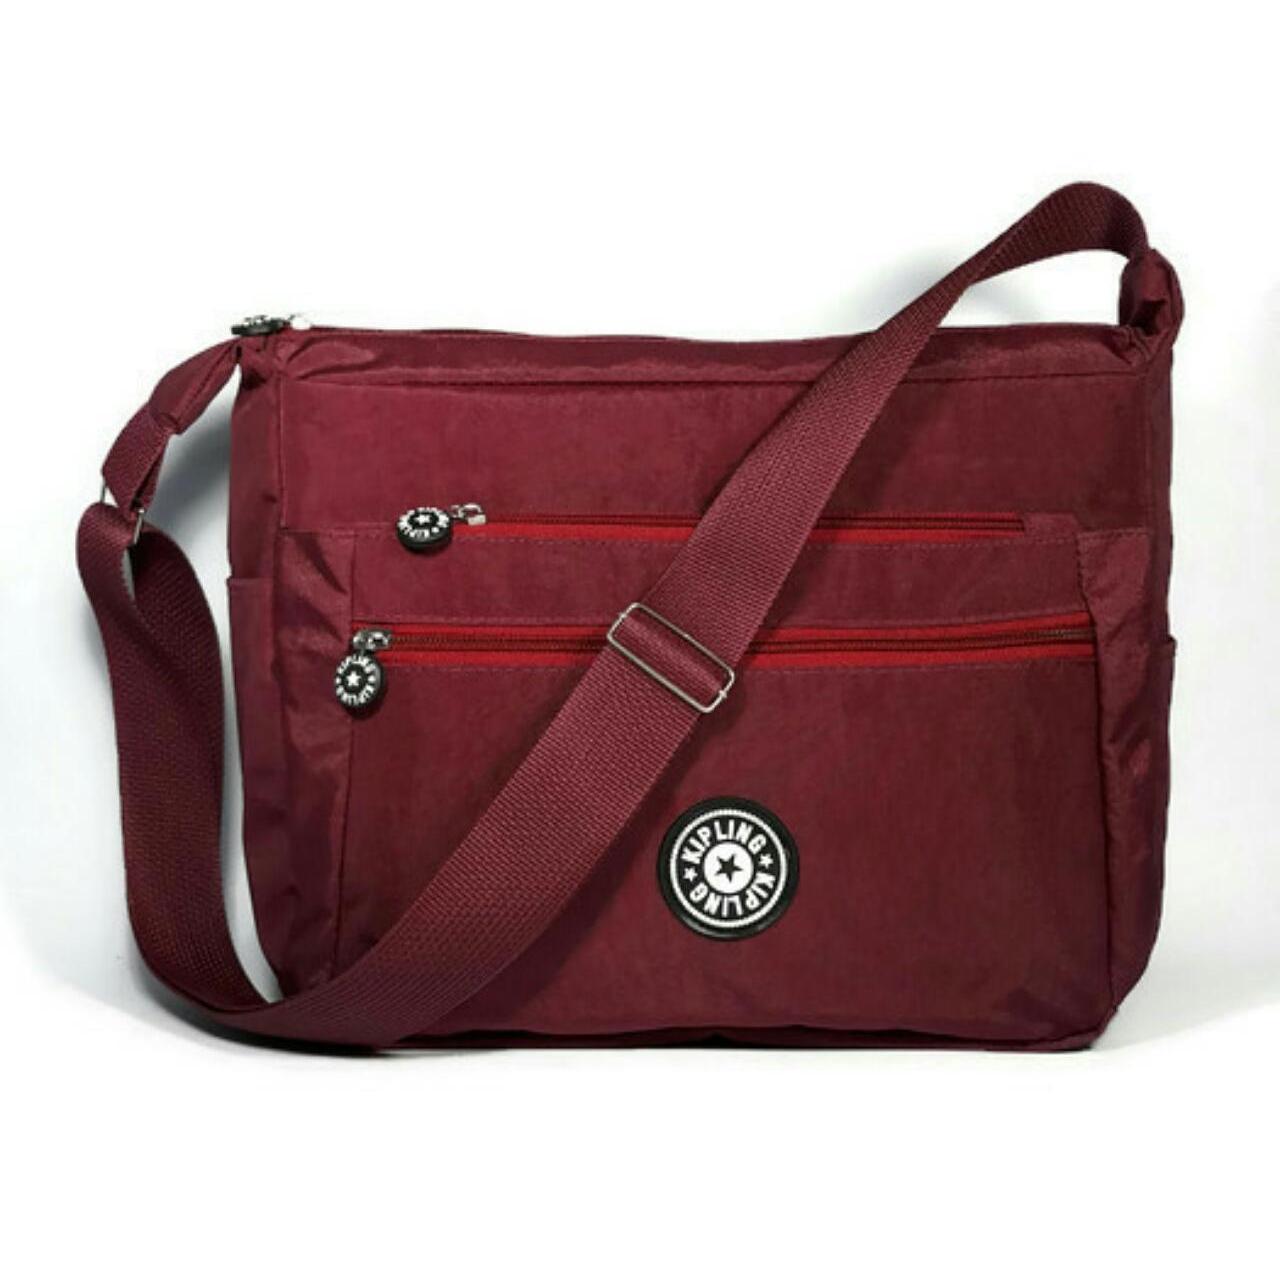 Tas Slempang Wanita / Sling Bag Fashion Wanita / Tas Branded Casual 002